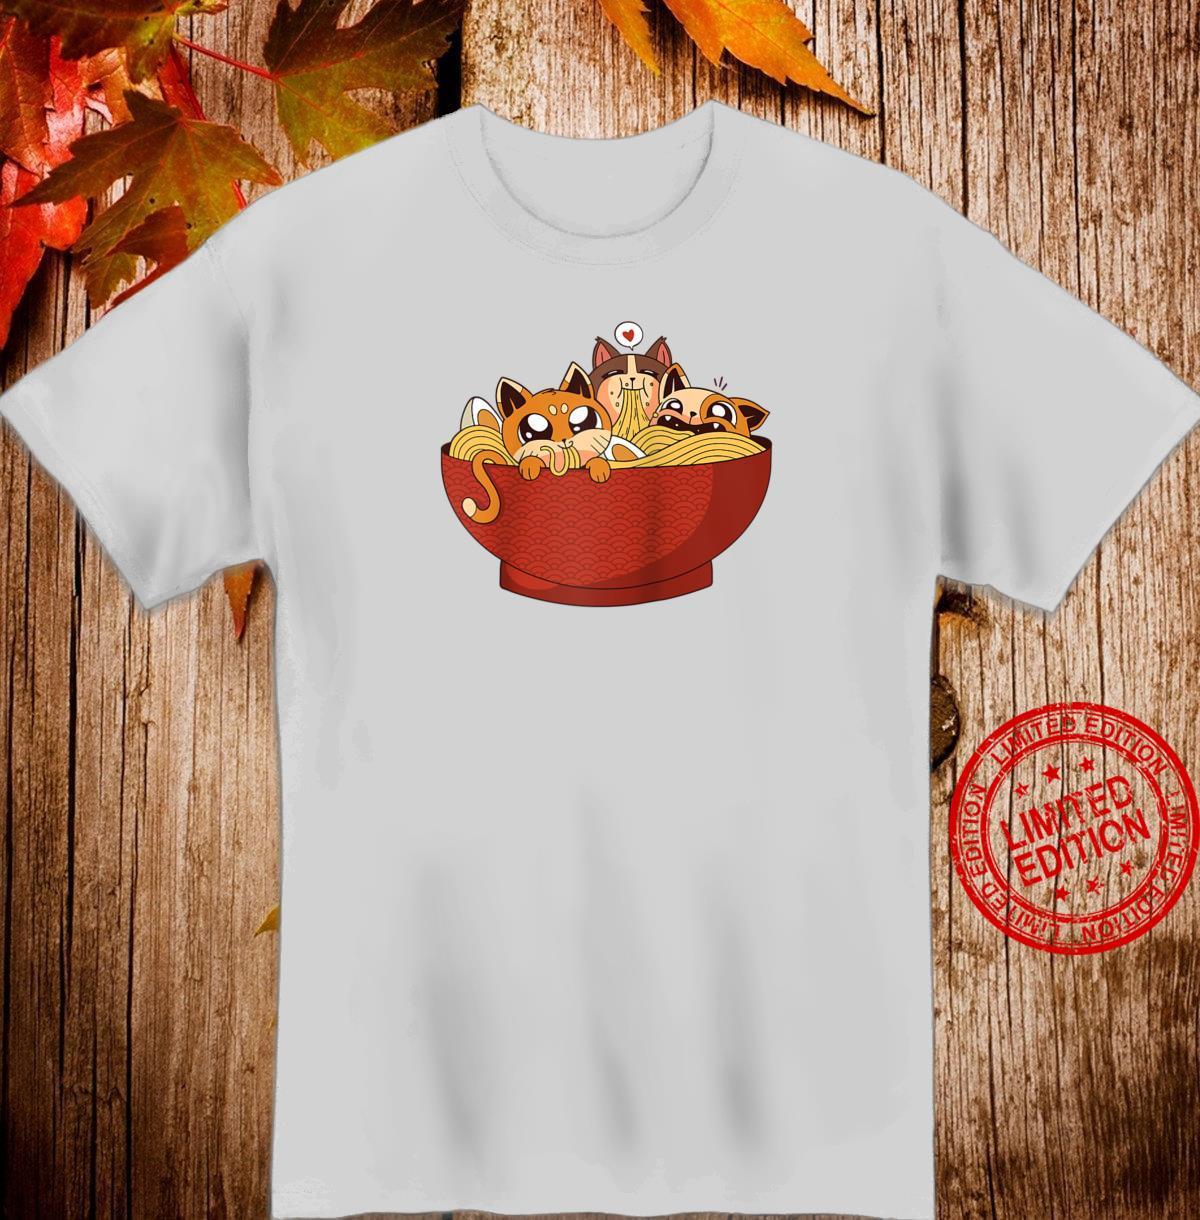 Kawaii cats eating ramen noodles Japanese Anime Aesthetic Shirt